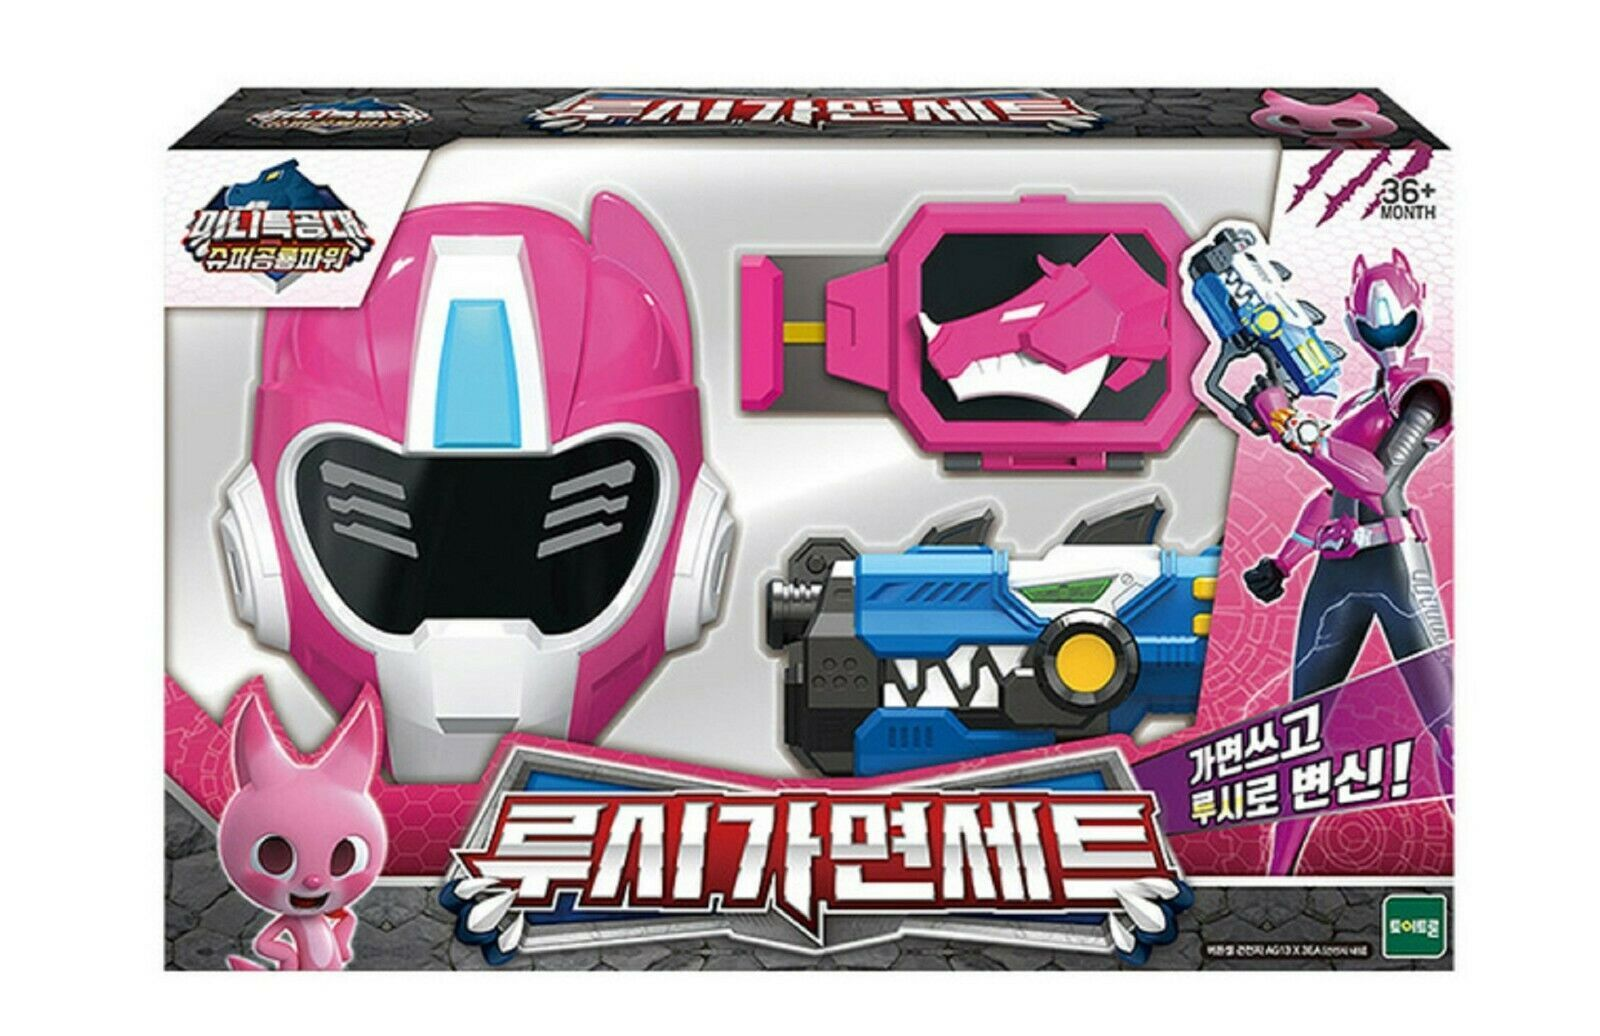 Miniforce Lucy Mask Belt Gun Playset Super Dinosaur Power Toy